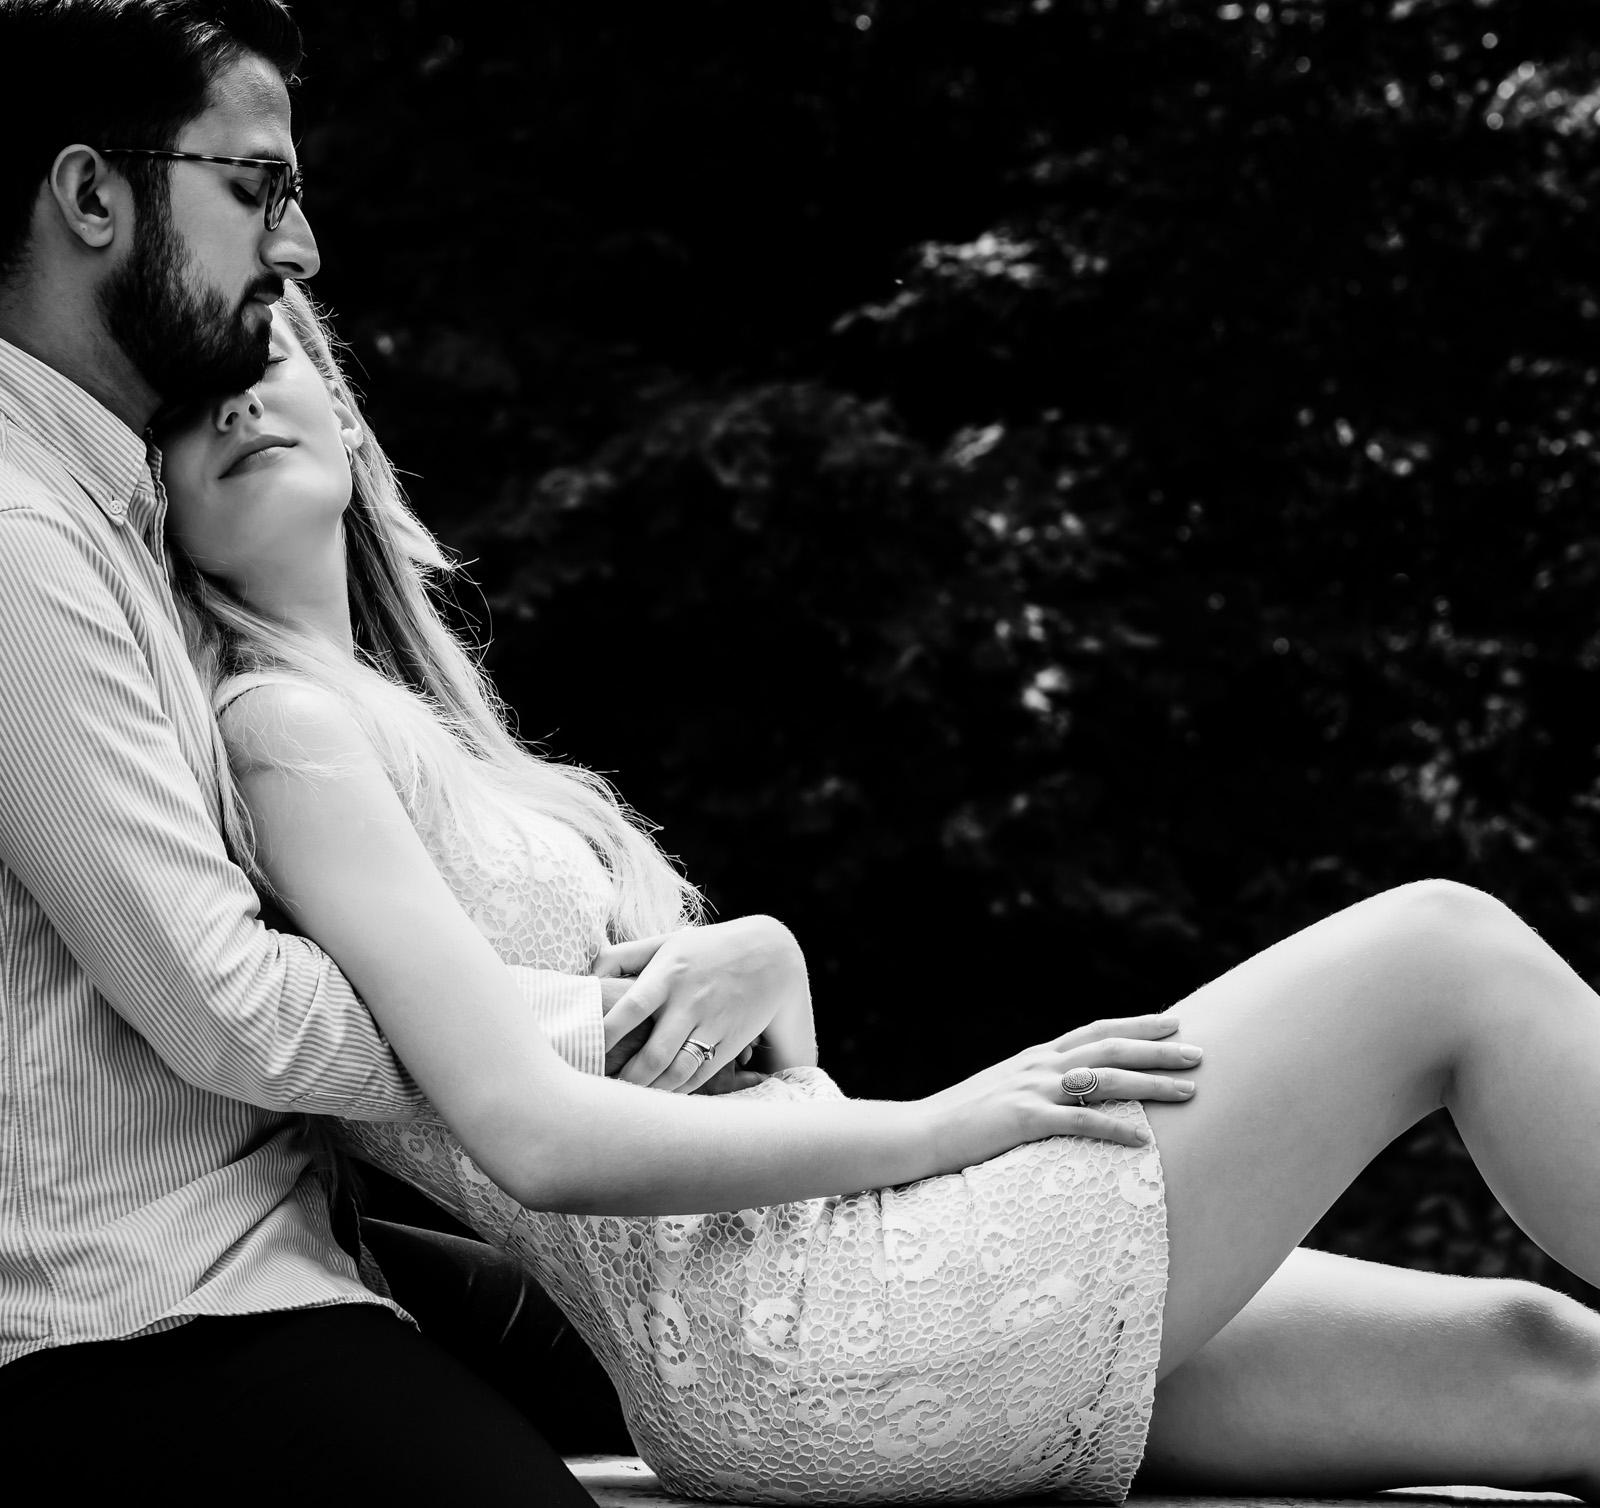 trouwfotograaf huwelijksreportage bruidsfotograaf Haarlem Heemstede Noord-Holland Lovesshoot Zalmiy Paeez Fotografie